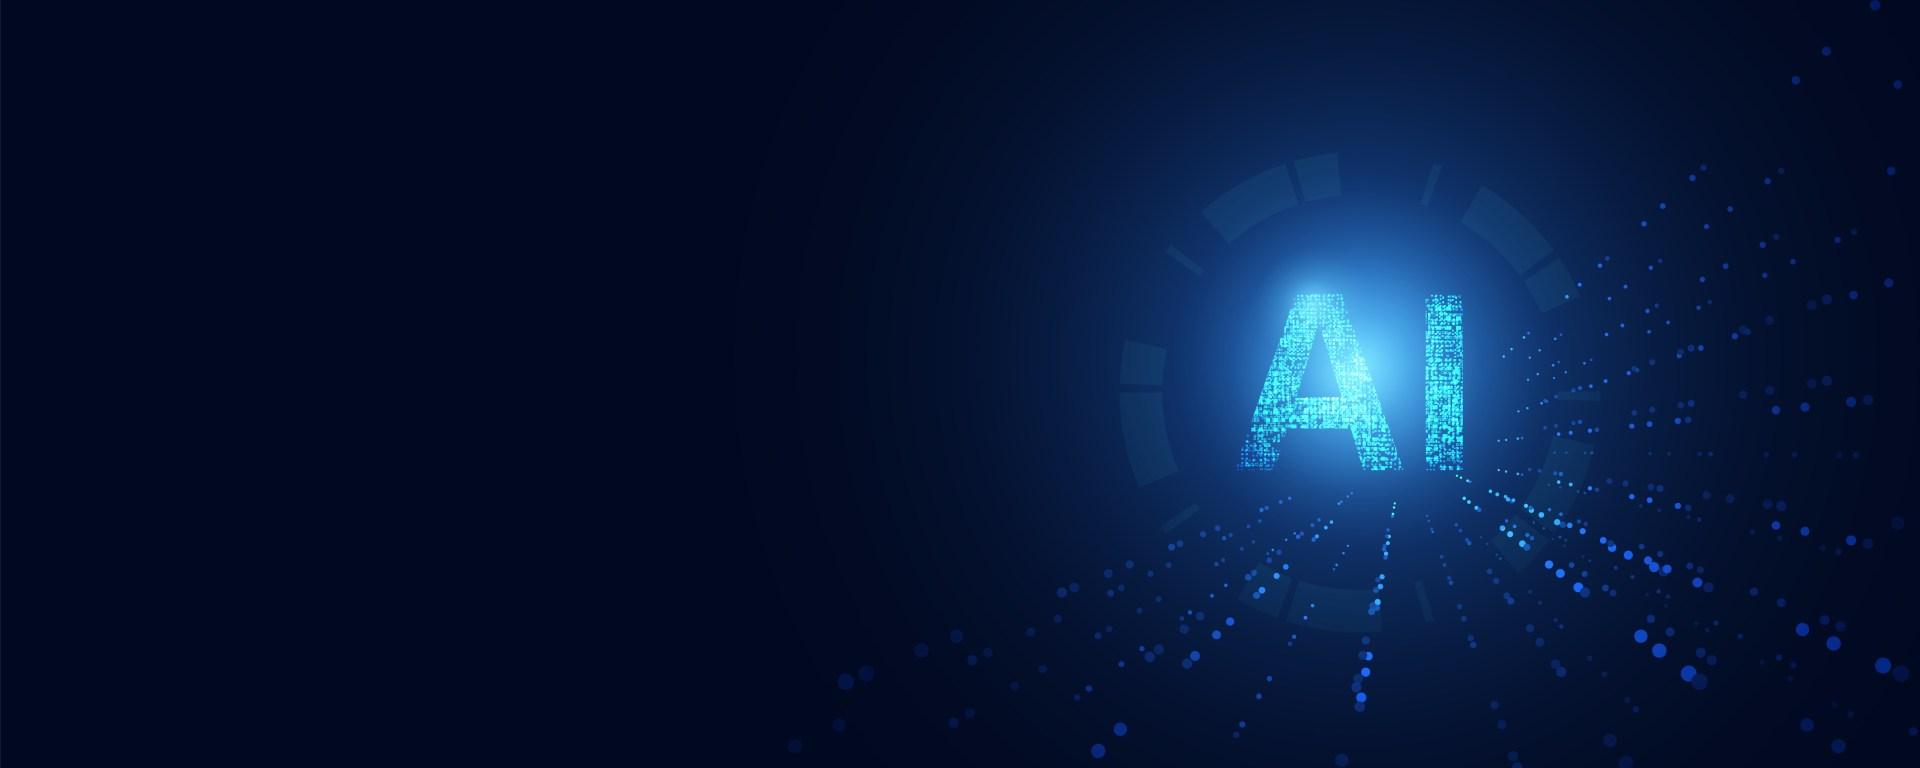 541 ledlights.blog